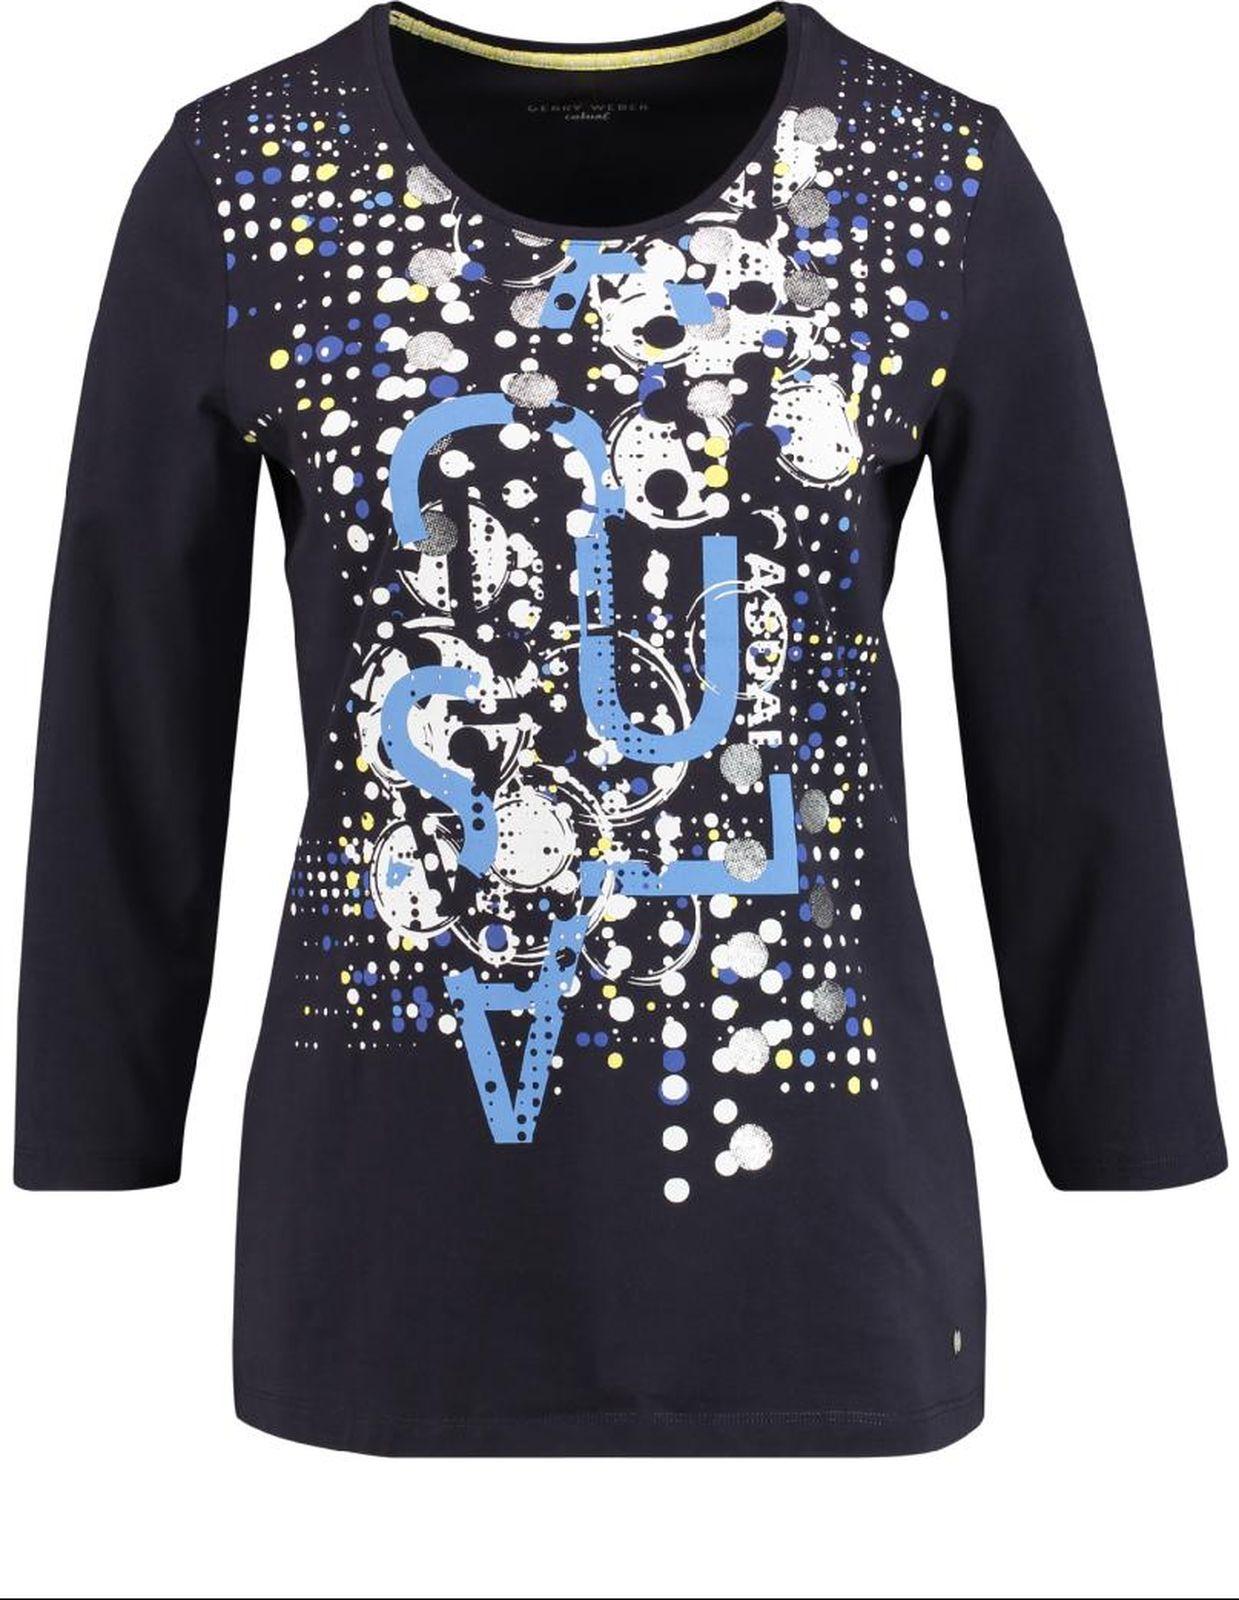 Пуловер женский Gerry Weber Casual, цвет: белый. 2 191-870 069-44022_99700. Размер 38 (44)2 191-870 069-44022_99700